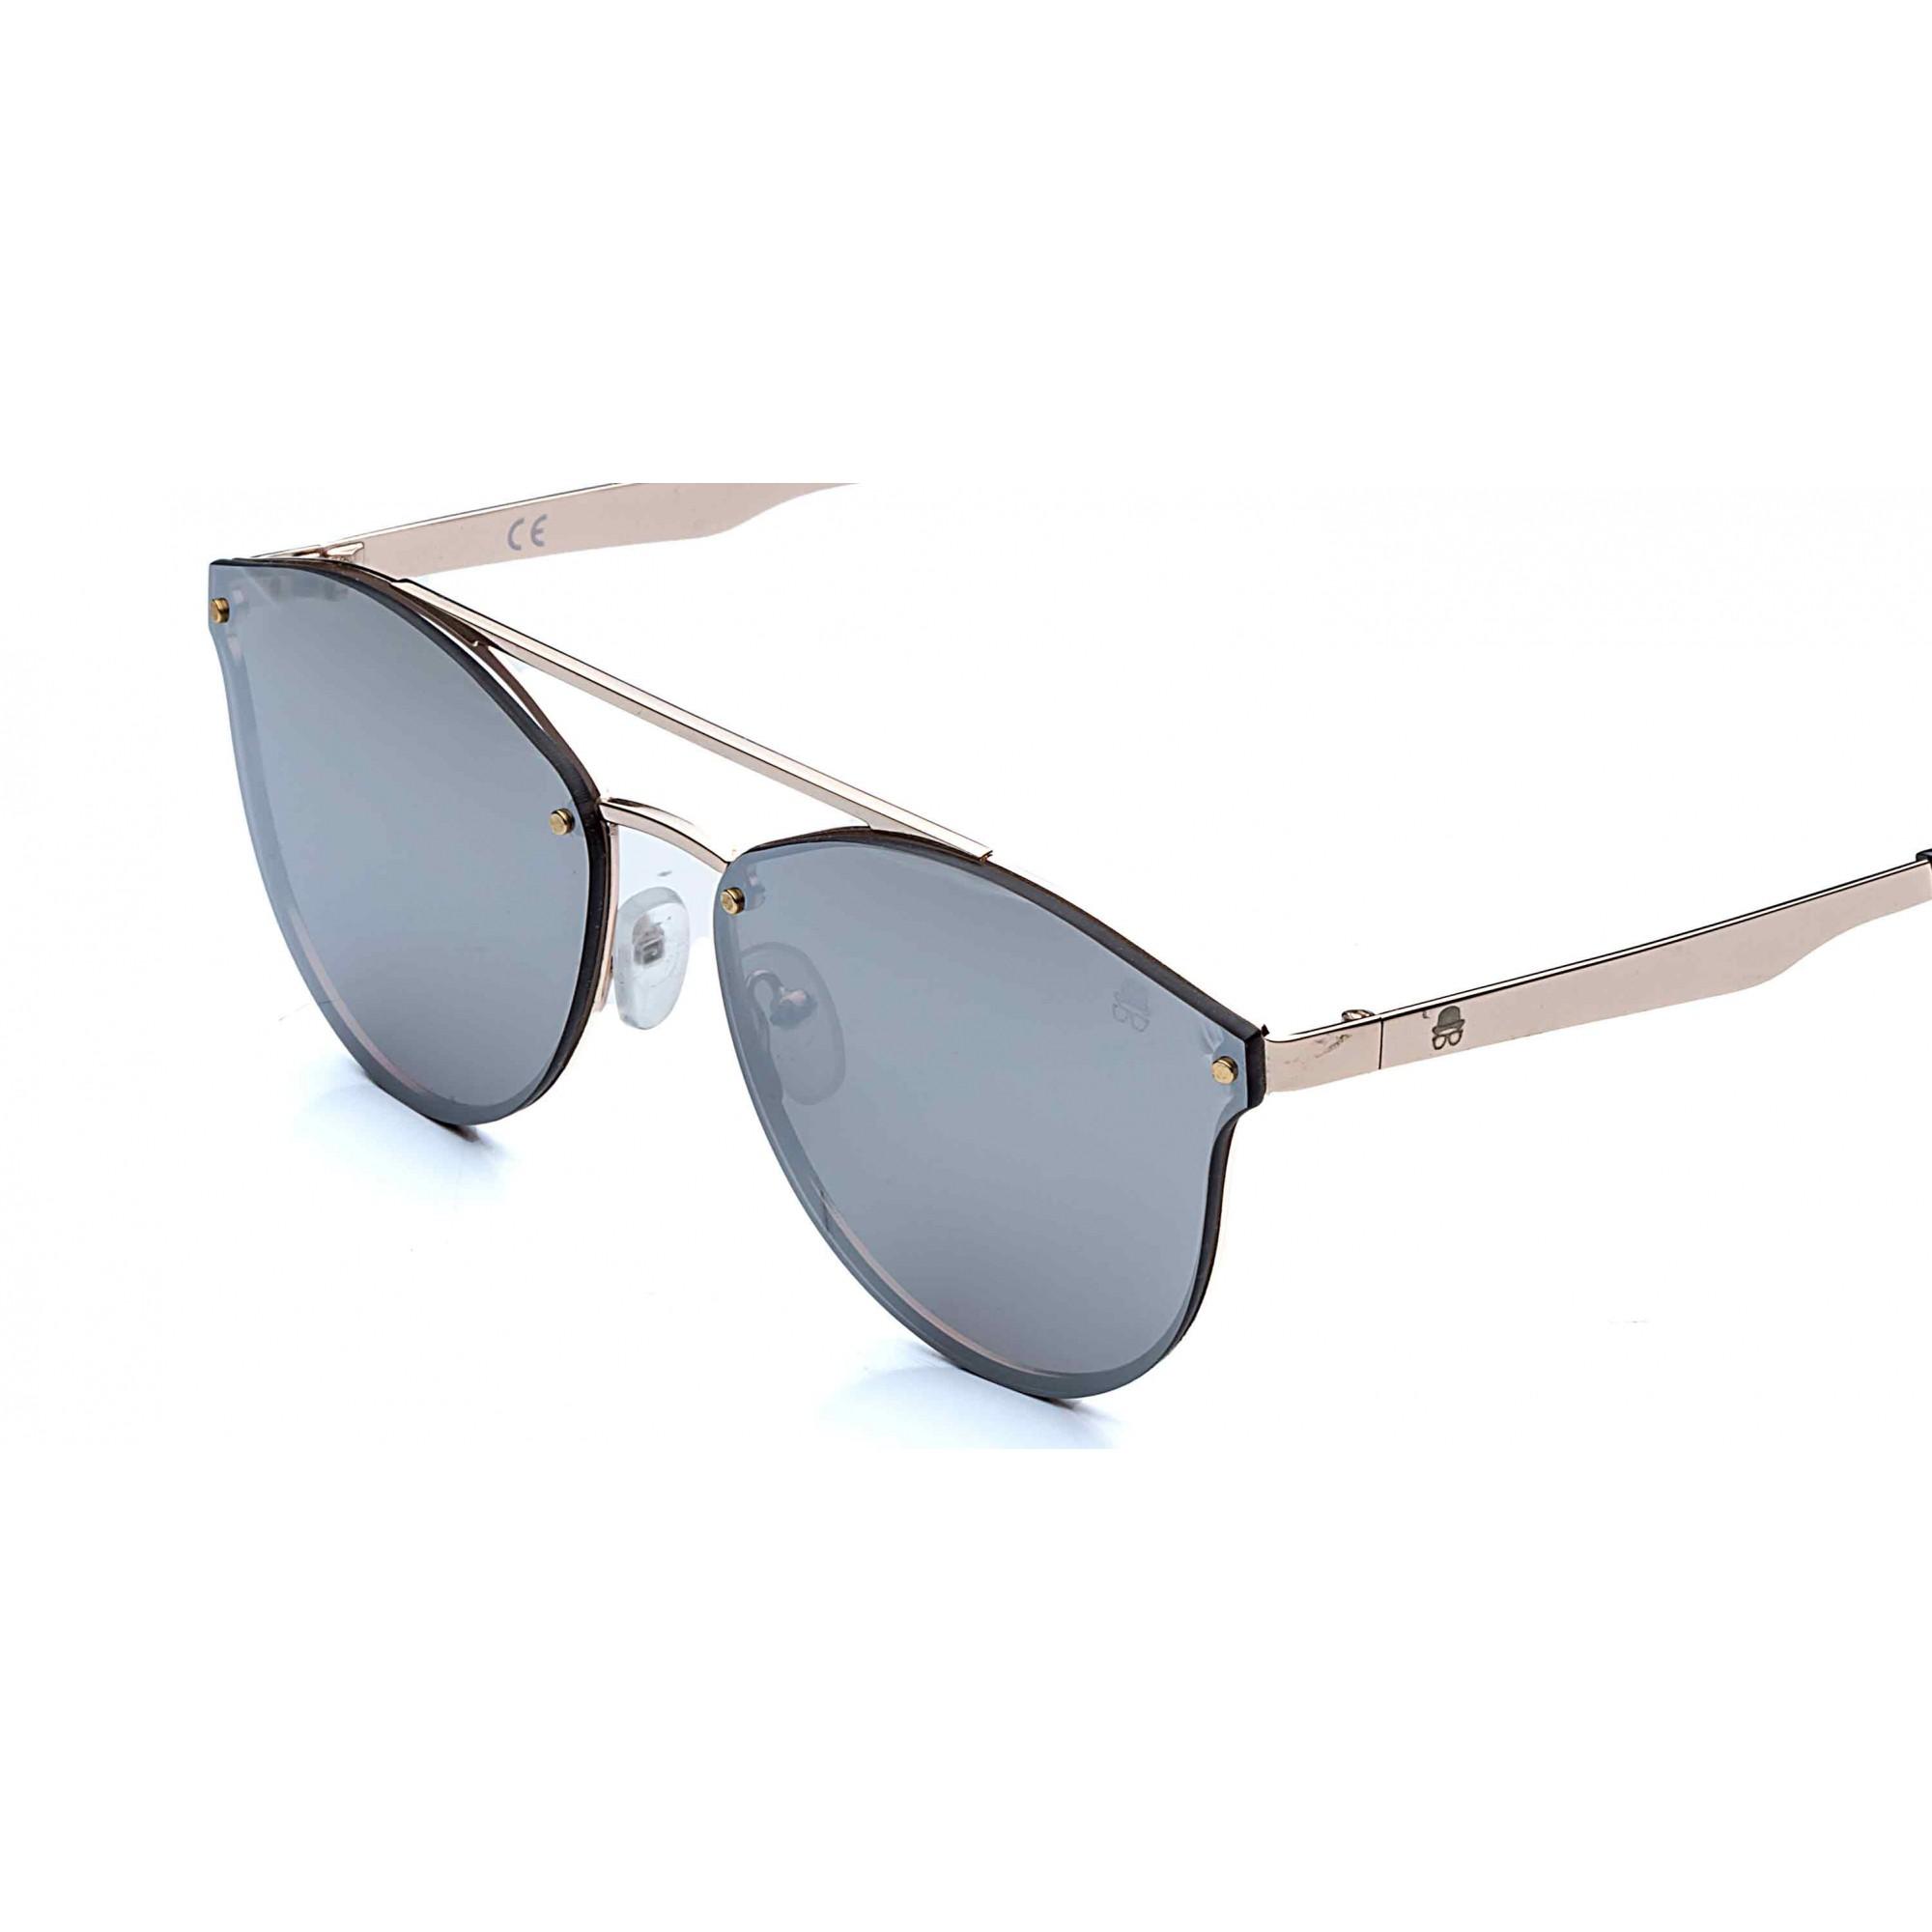 Óculos de Sol Leona Rafael Lopes